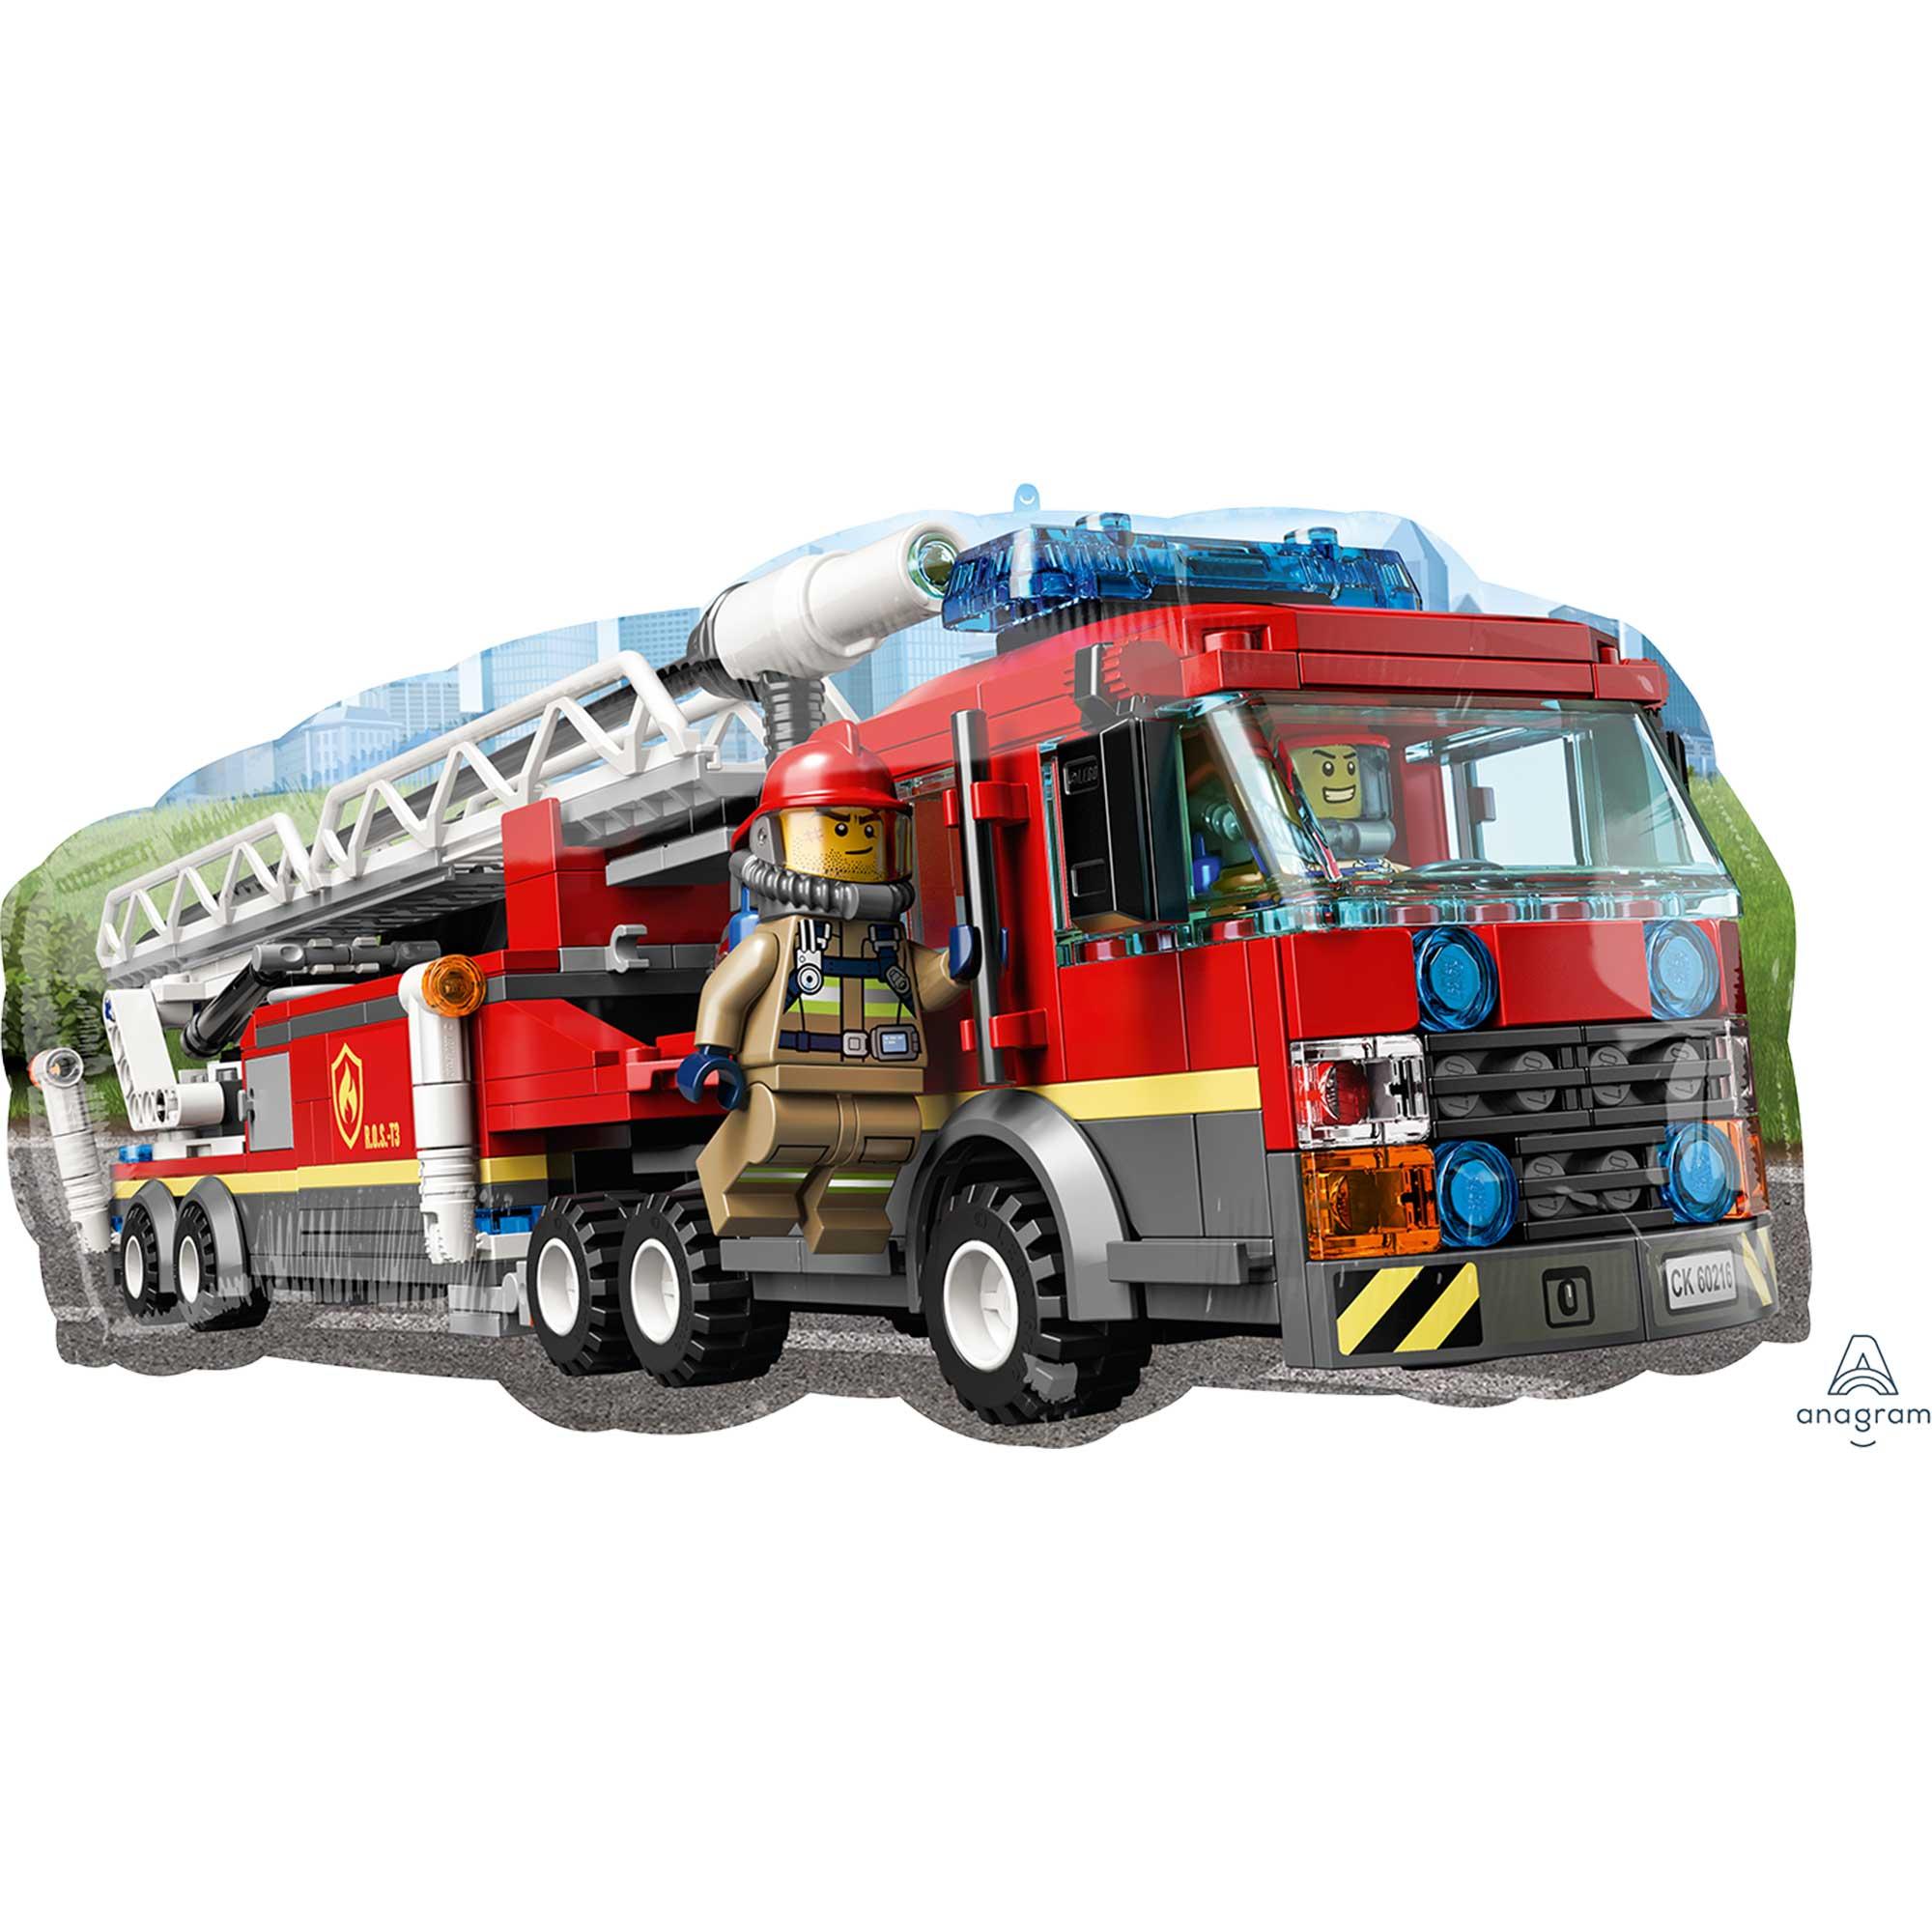 SuperShape Lego City Fire Truck P38